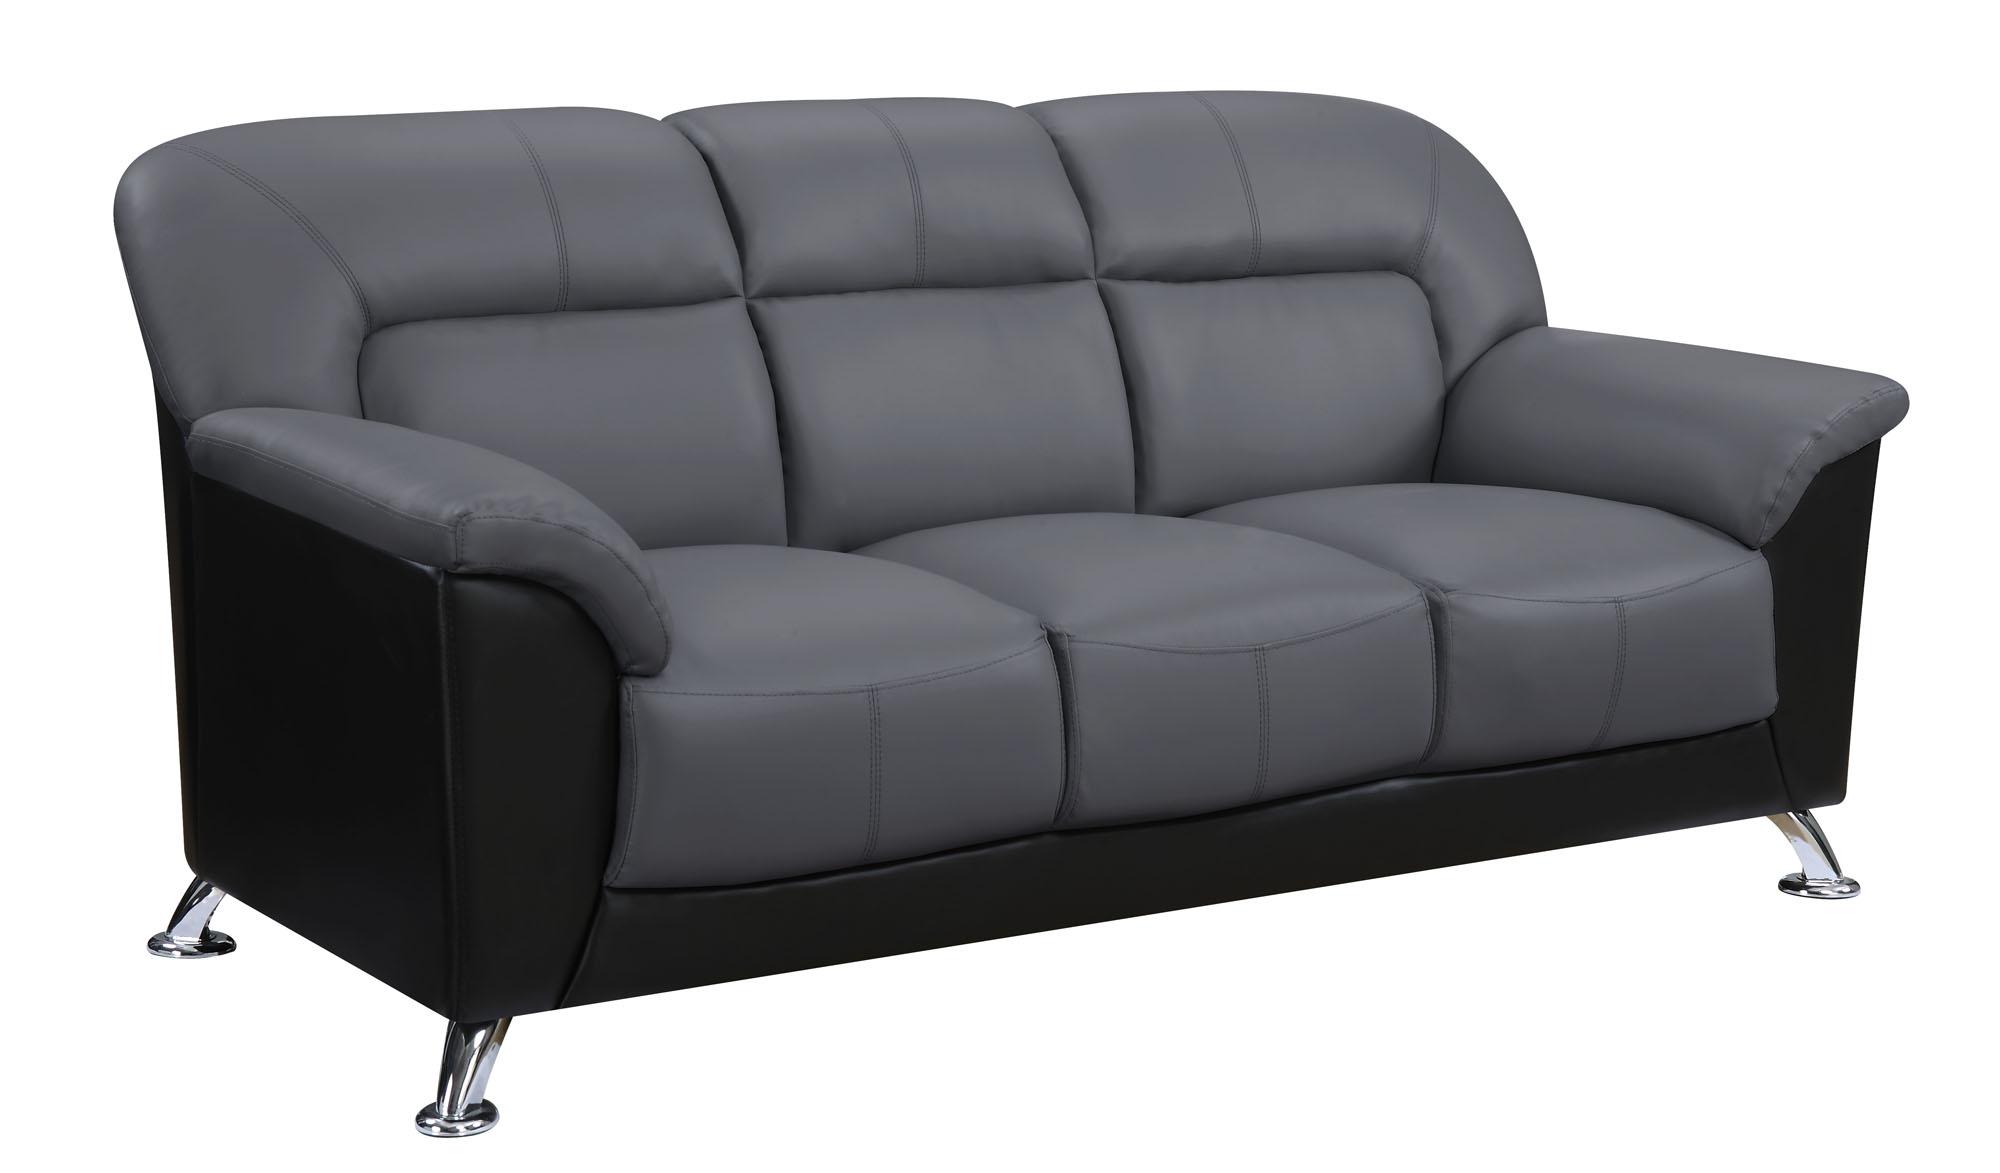 Bon U9102 Dark Grey/Black Vinyl Sofa By Global Furniture (Global Furniture)